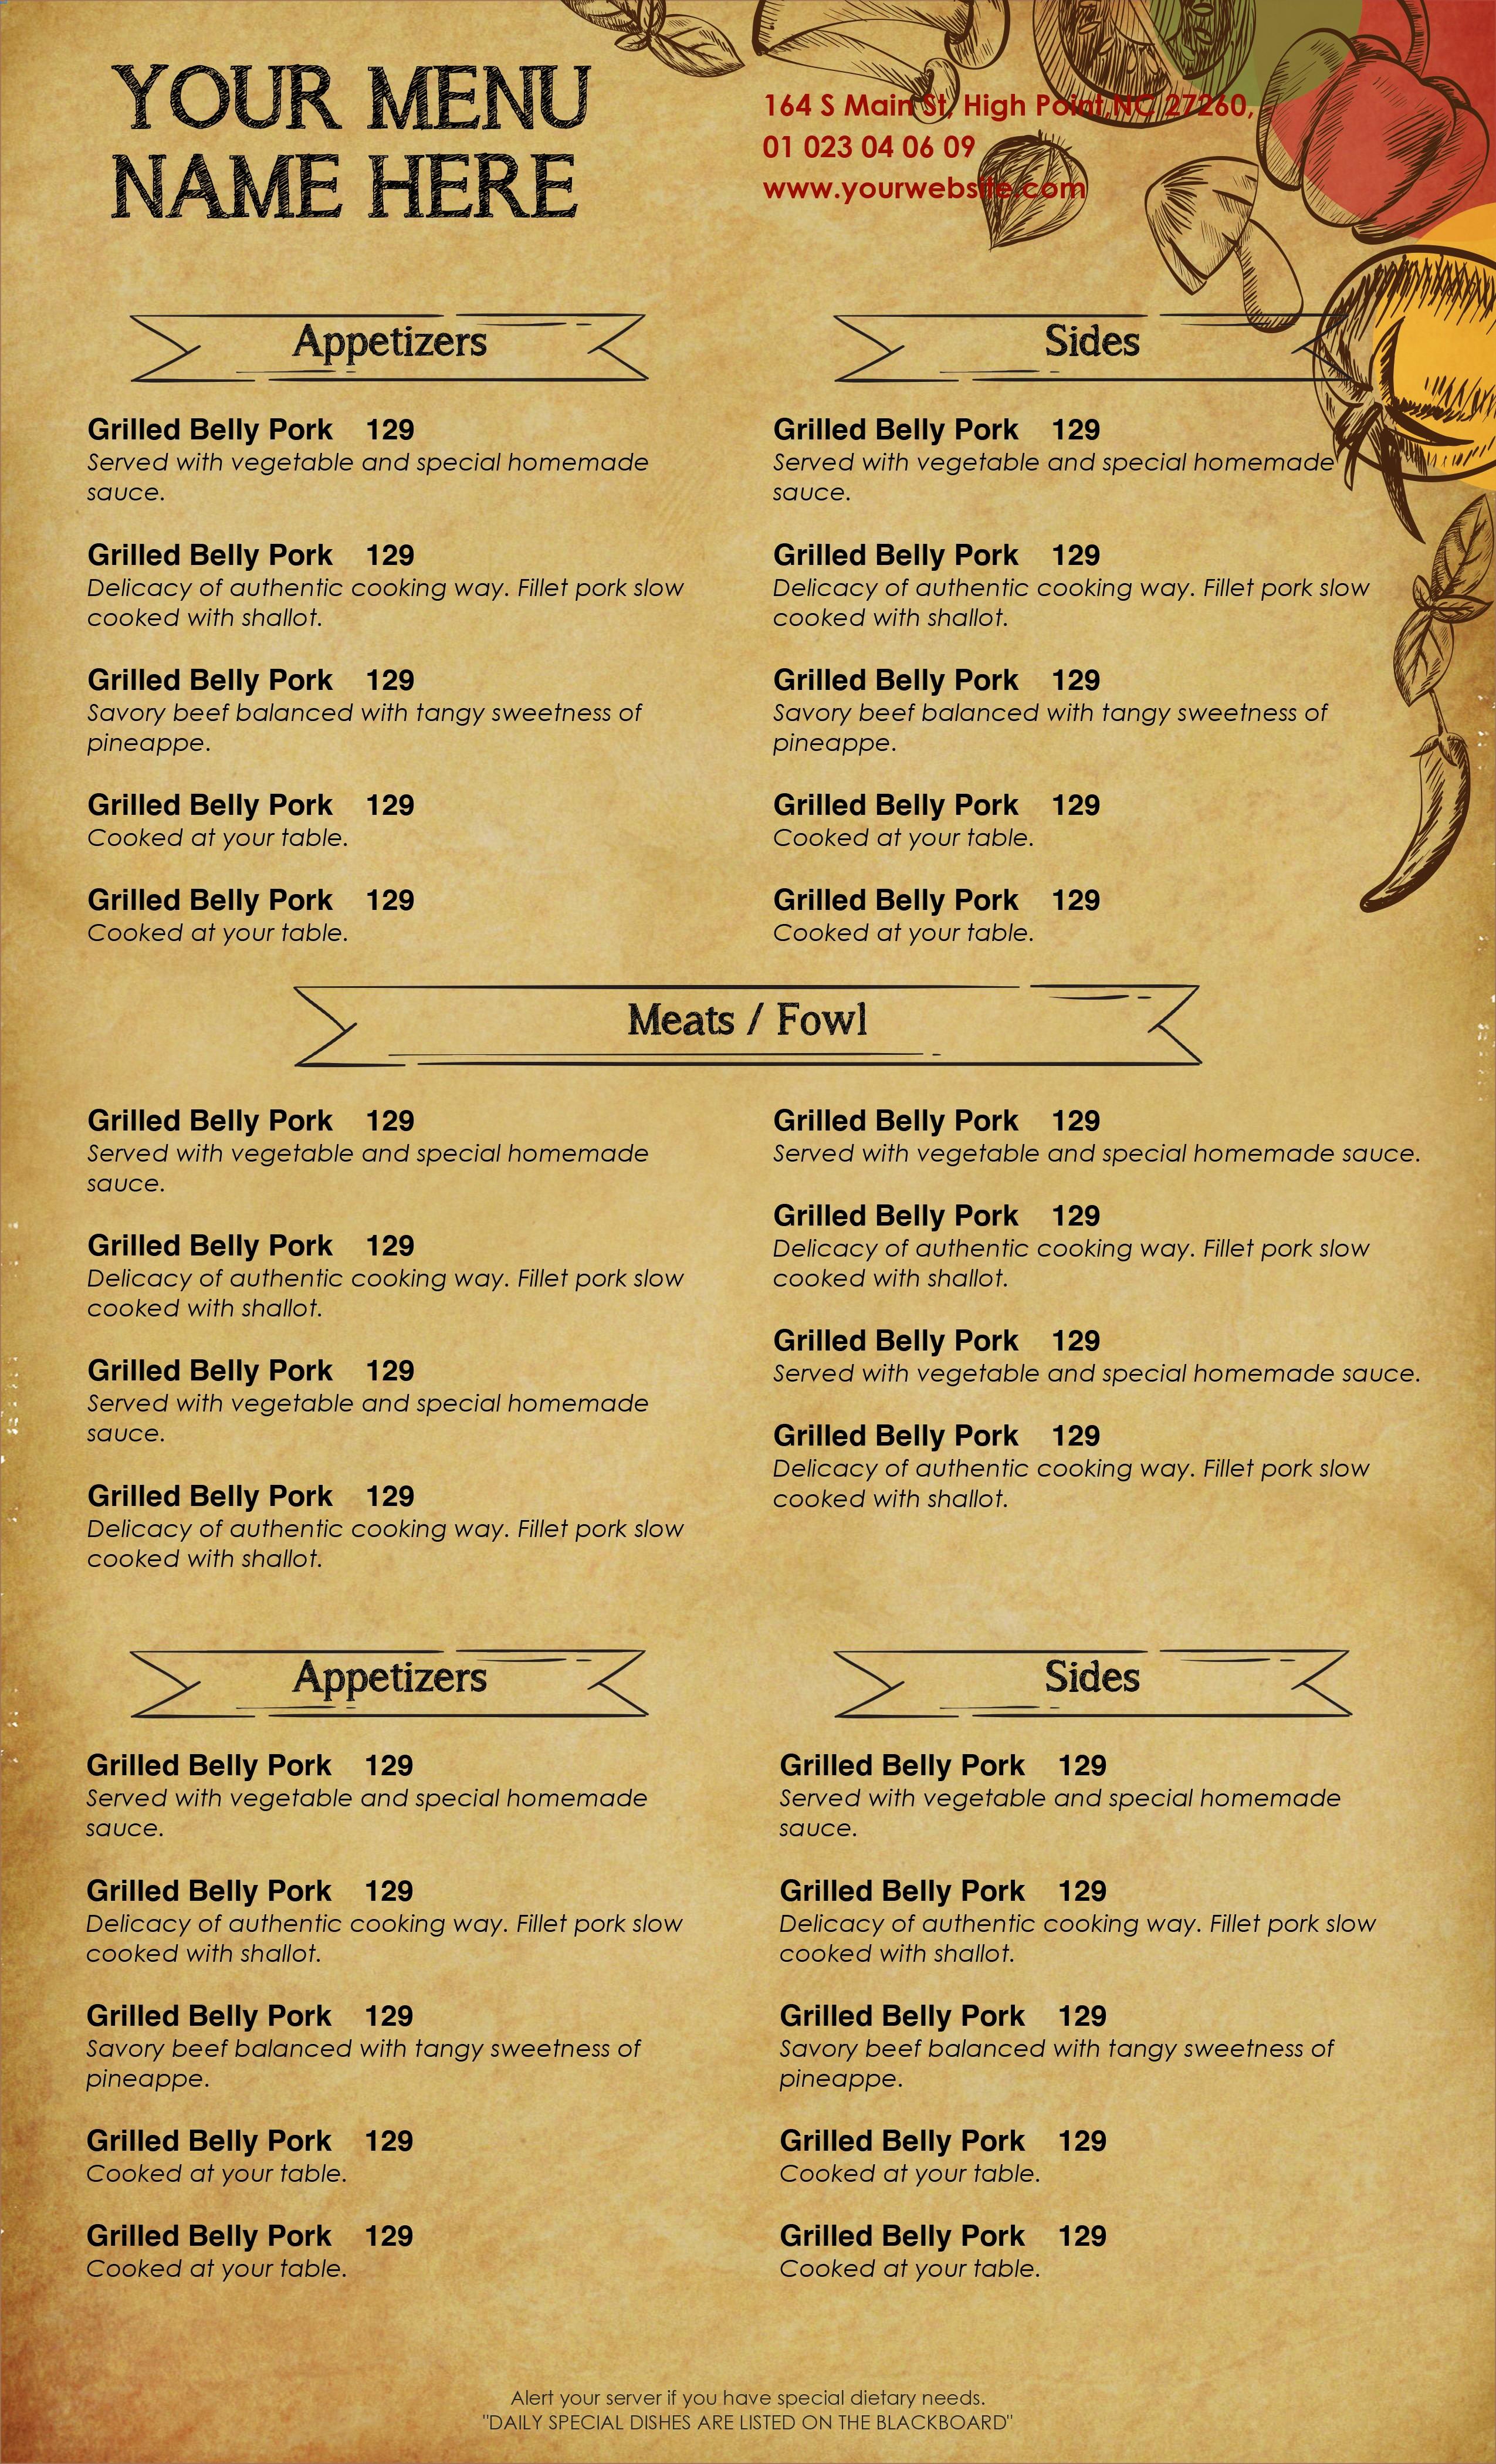 Free Editable Restaurant Menu Templates Awesome Design & Templates Menu Templates Wedding Menu Food